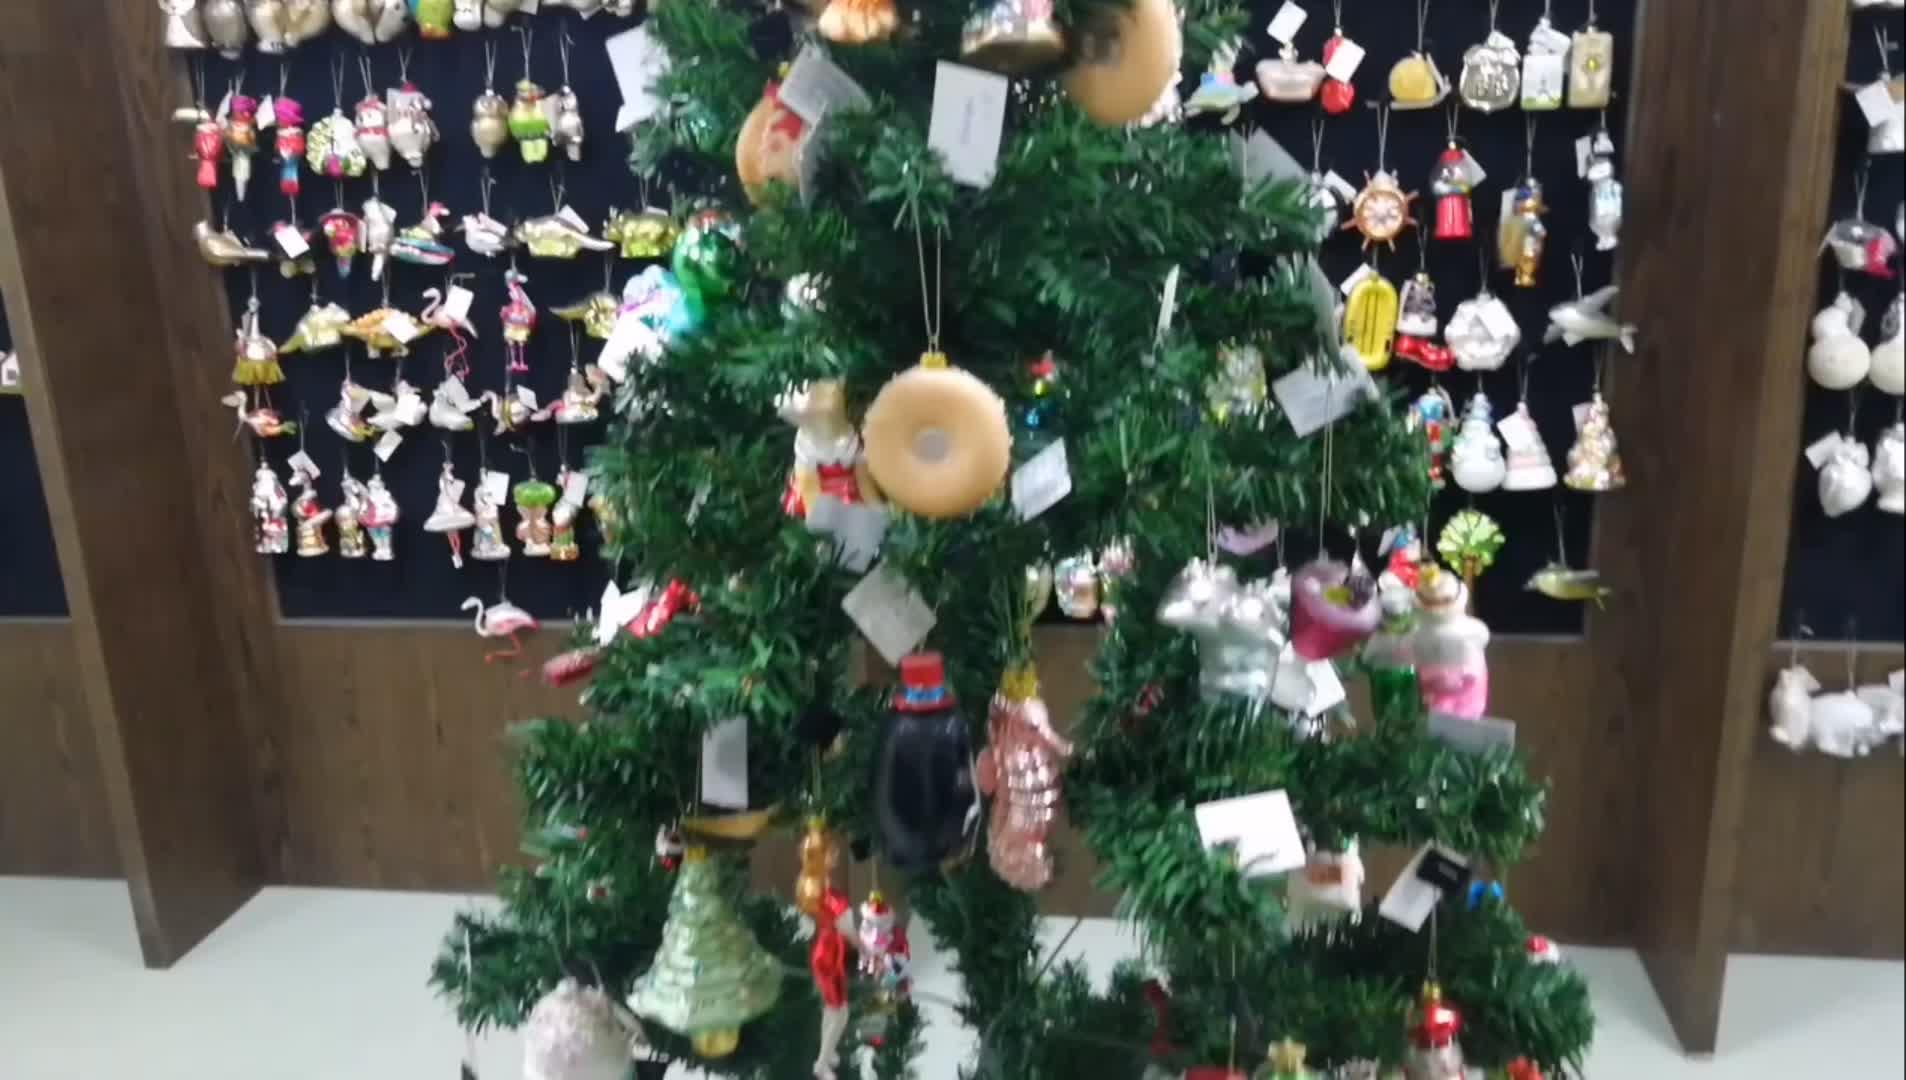 New Style Fashionable Christmas Animal Ornaments Glass Giraffe Ornaments